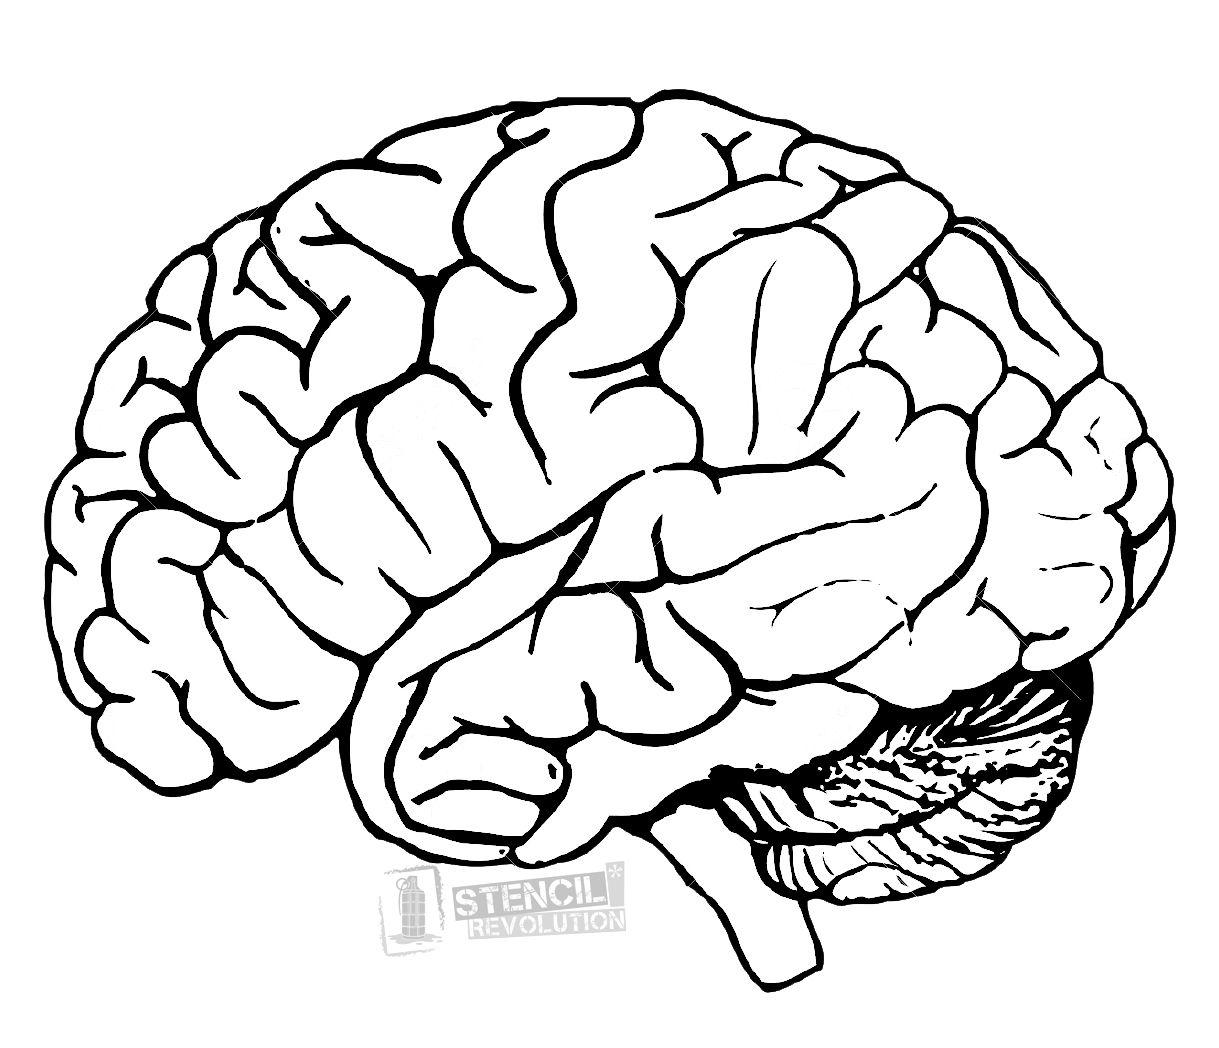 Brain clipart human brain. Stencil stencils and patches